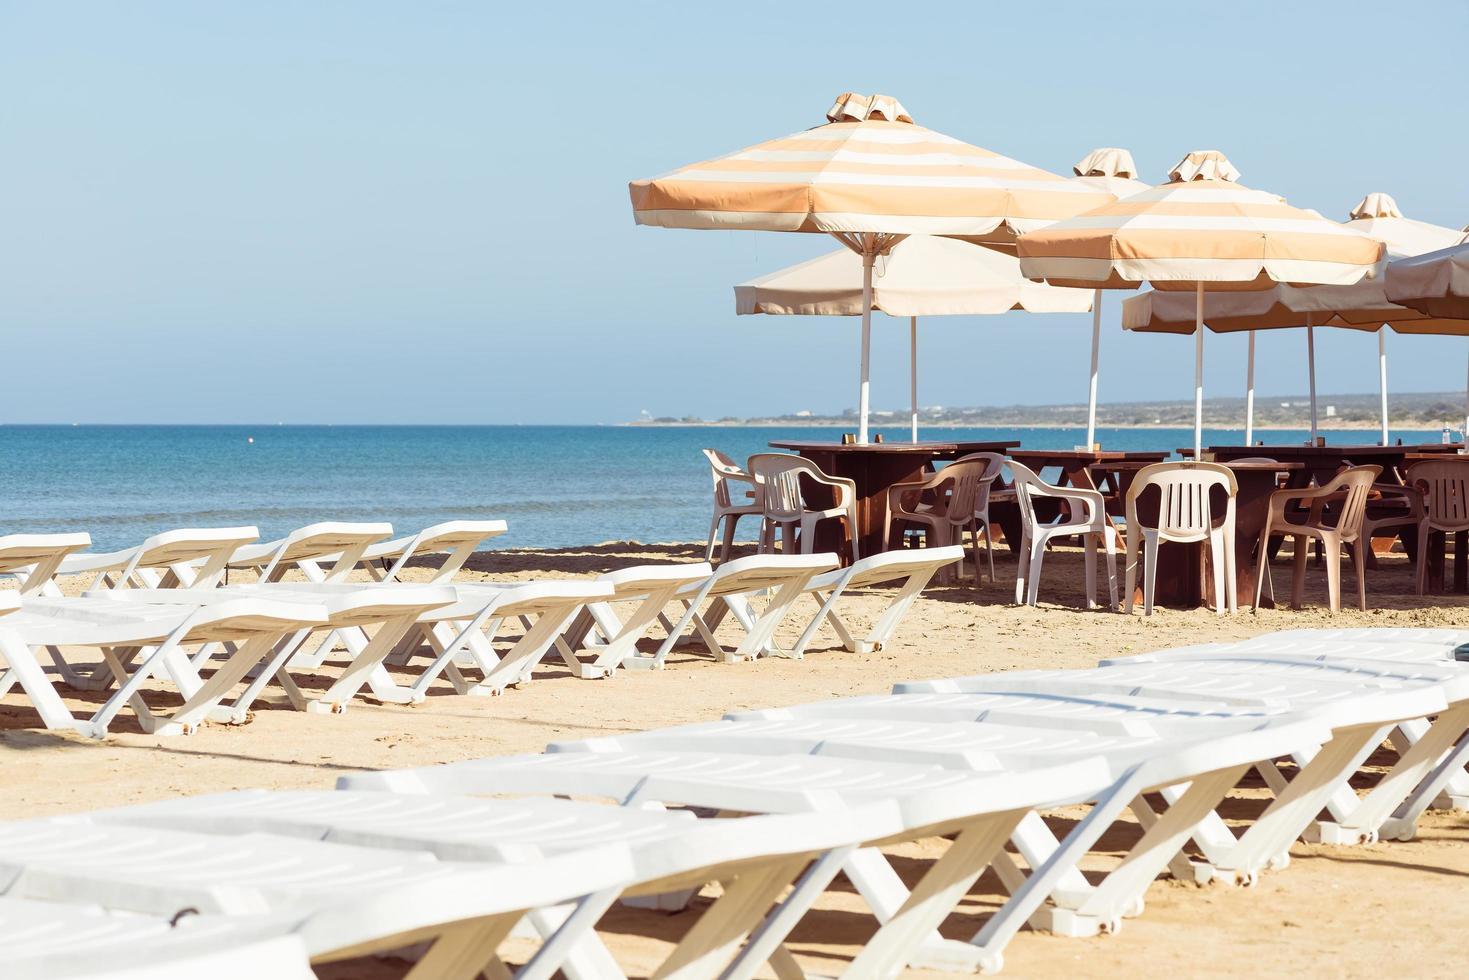 lege ligbedden en parasols op het strand foto